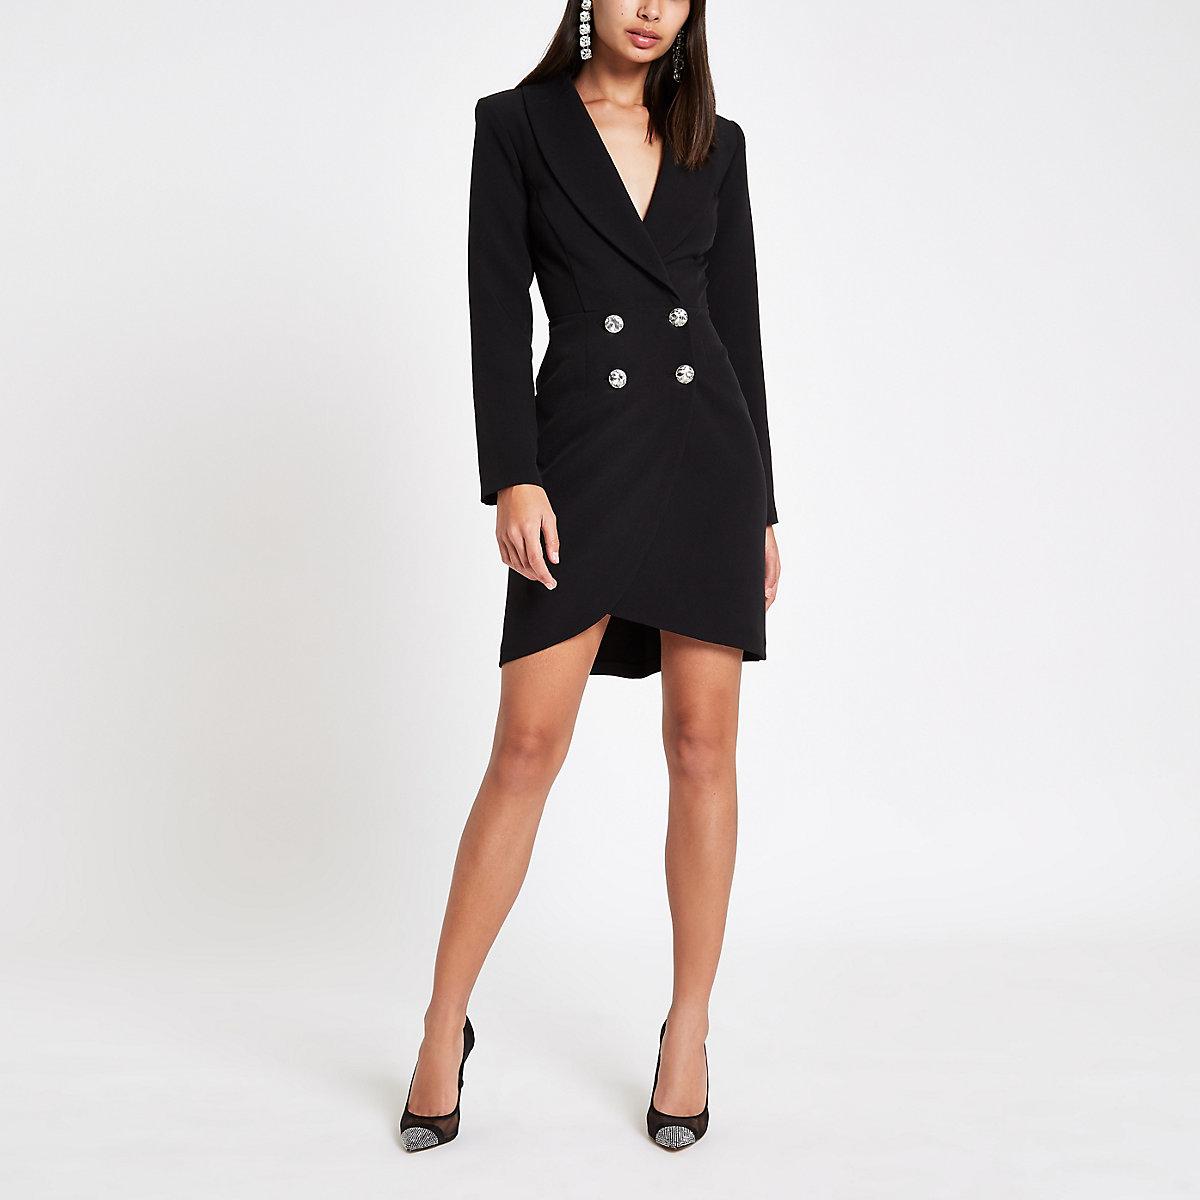 Black rhinestone embellished bodycon tux dress